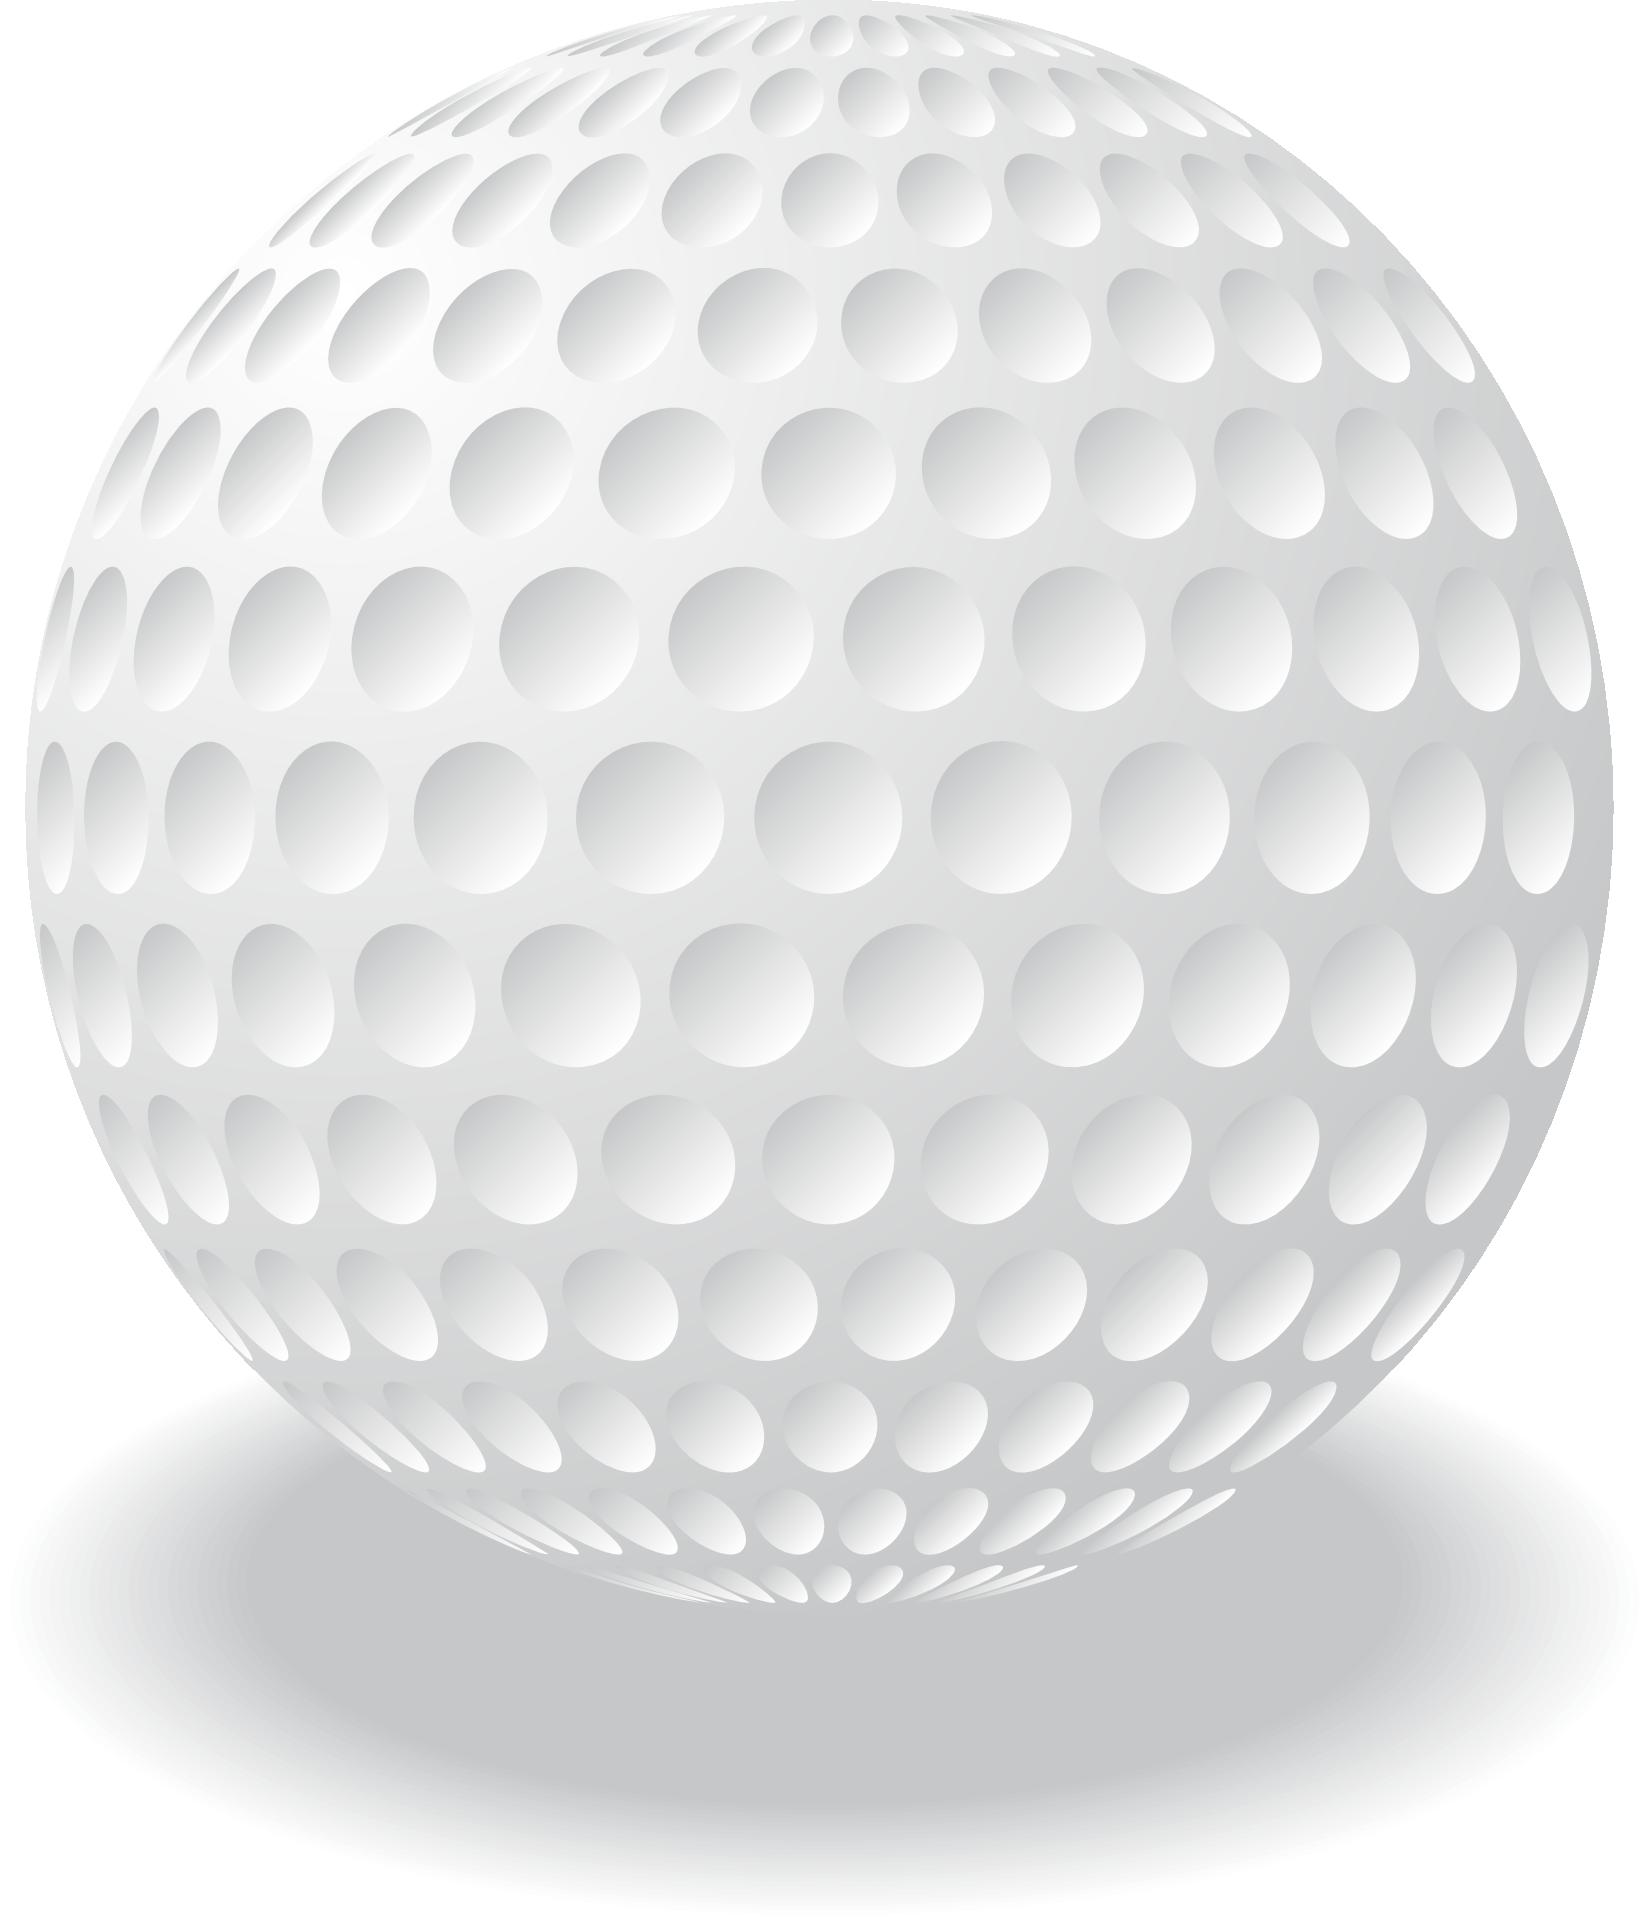 White Golf Ball Vector